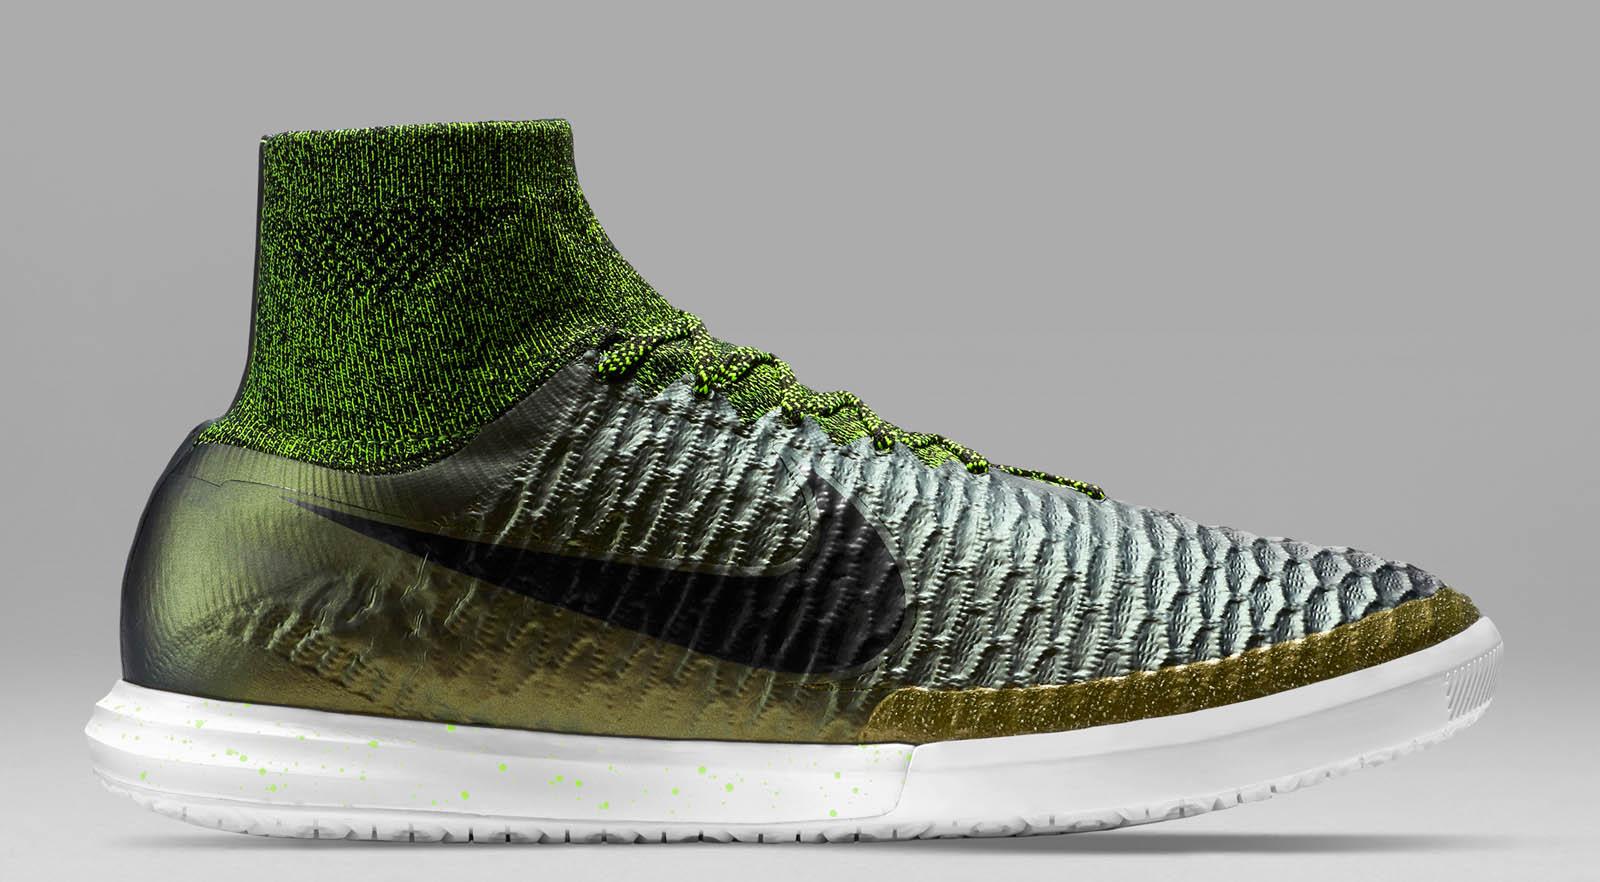 278b5c9fcb2e Nike Magista X Proximo Dark Citron   Black   White. This is the new gold ...